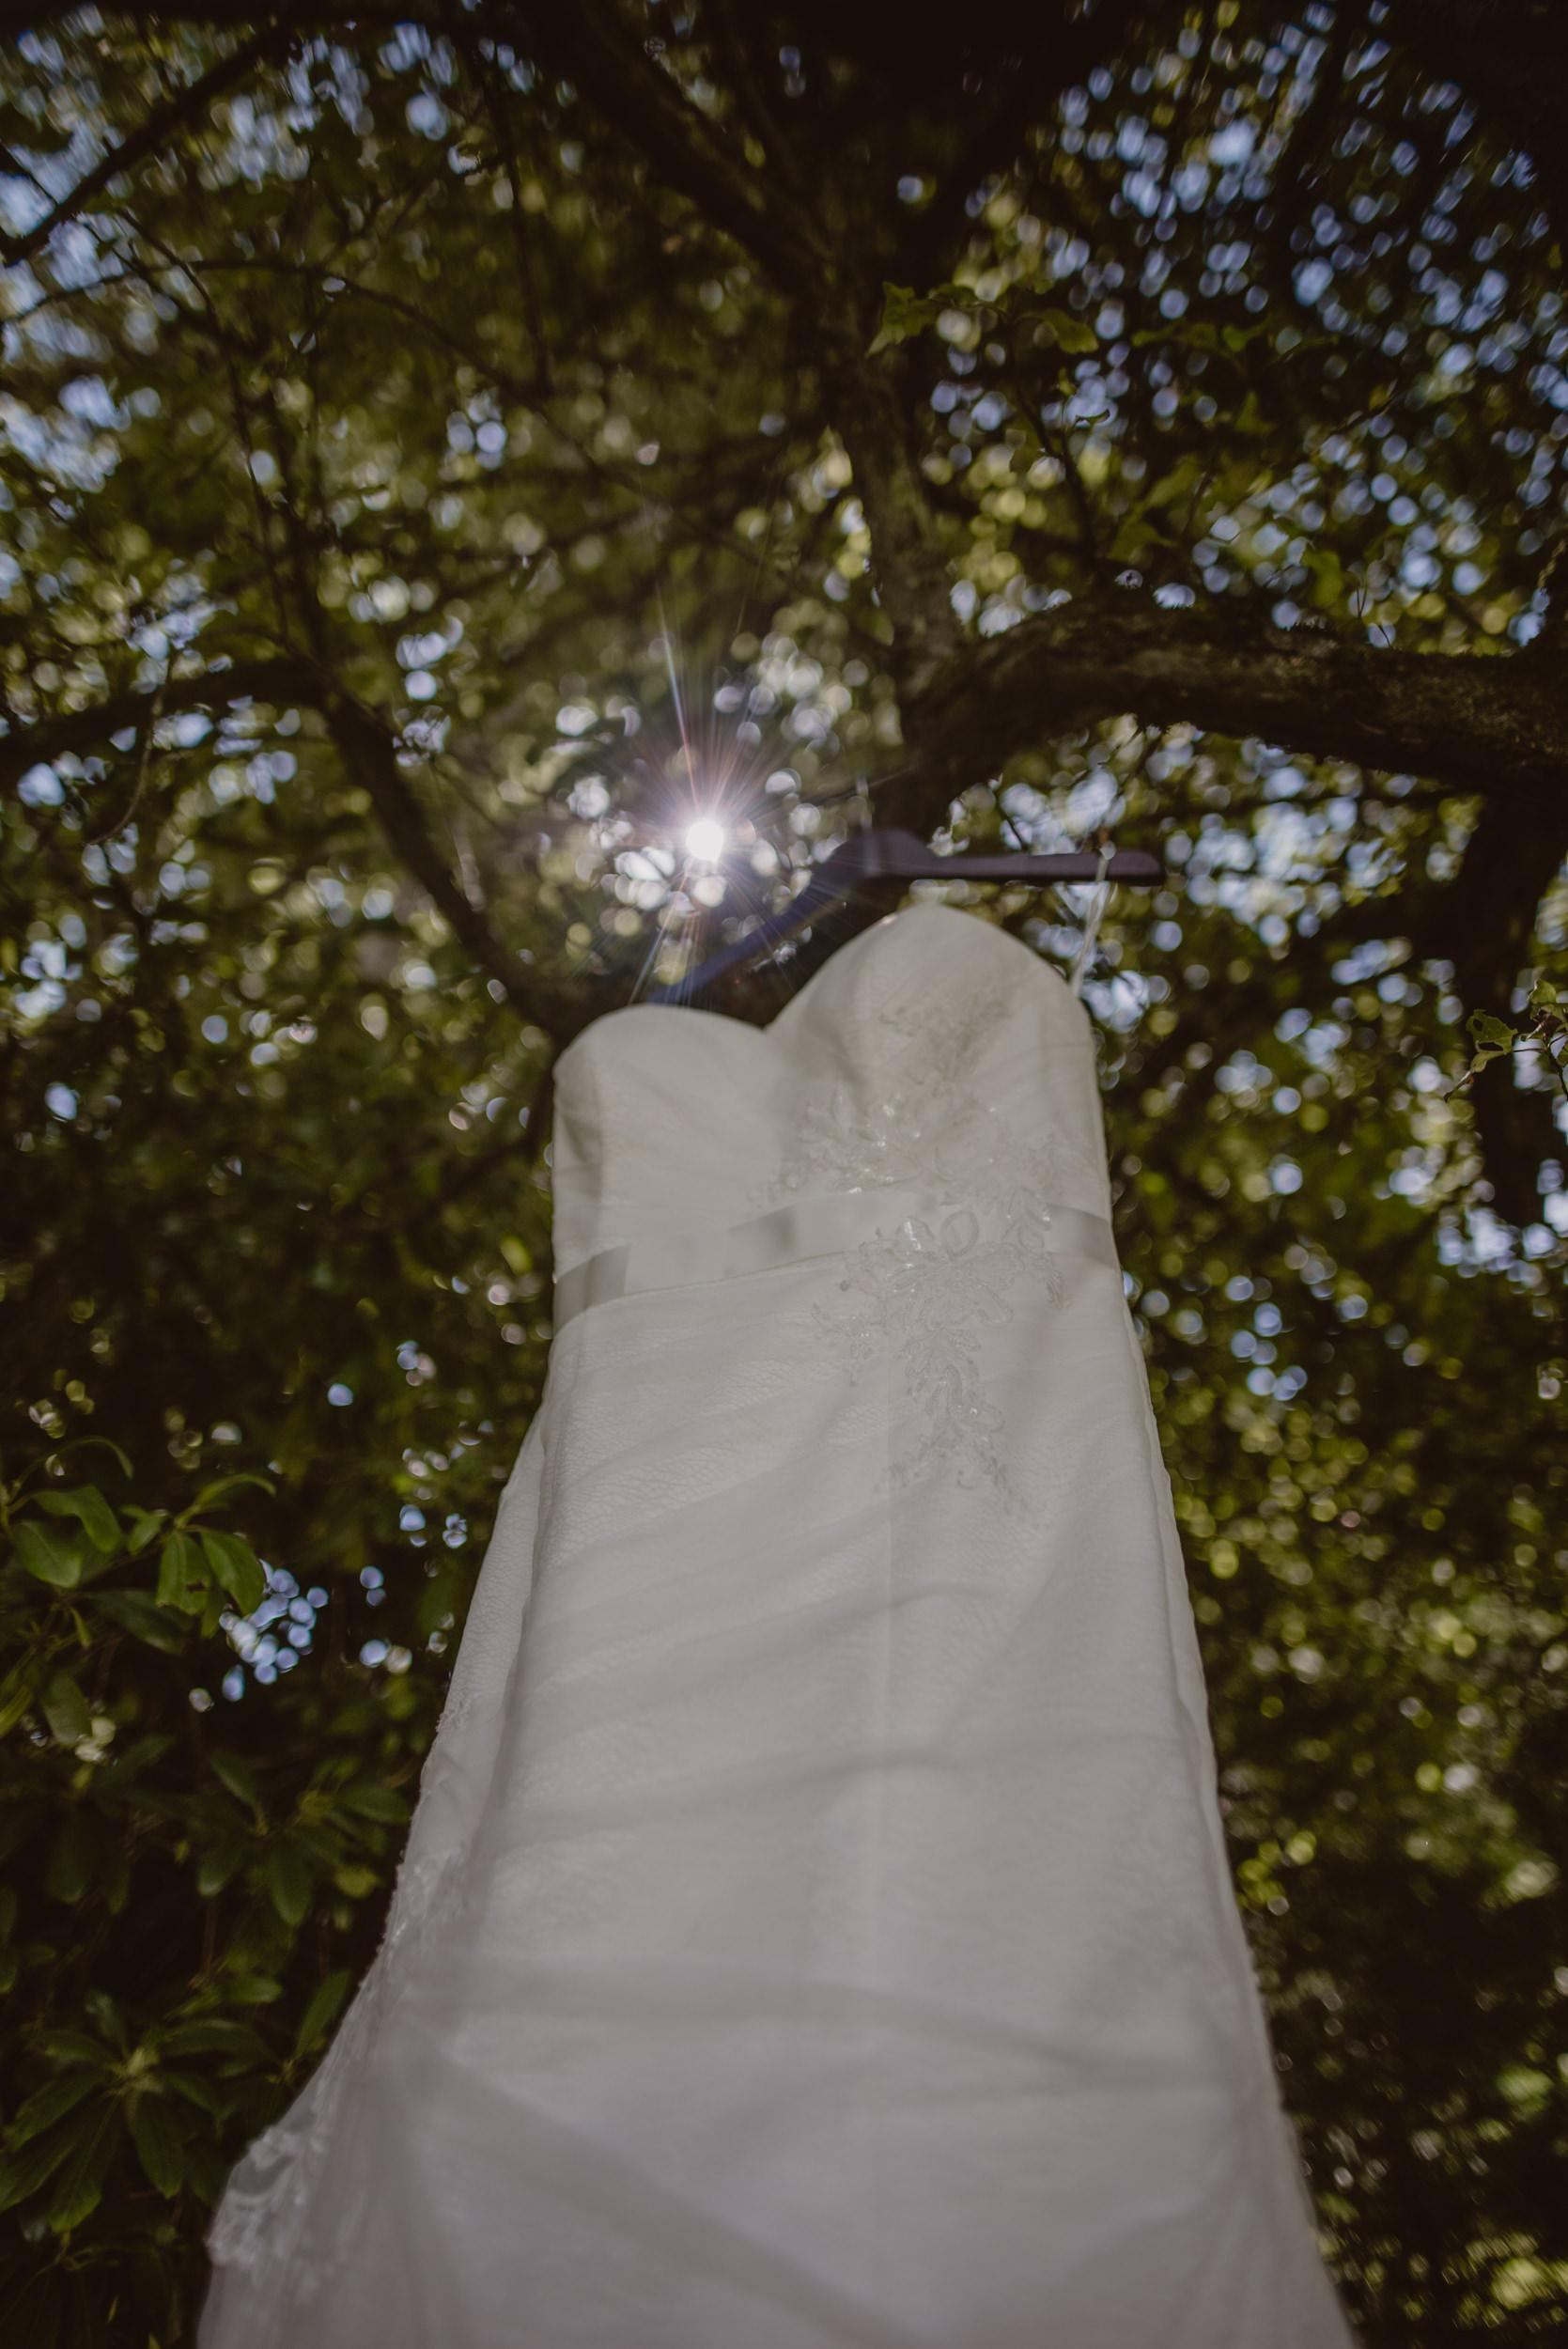 Chantelle-and-Stephen-Old-Thorns-Hotel-Wedding-Liphook-Manu-Mendoza-Wedding-Photography-069.jpg